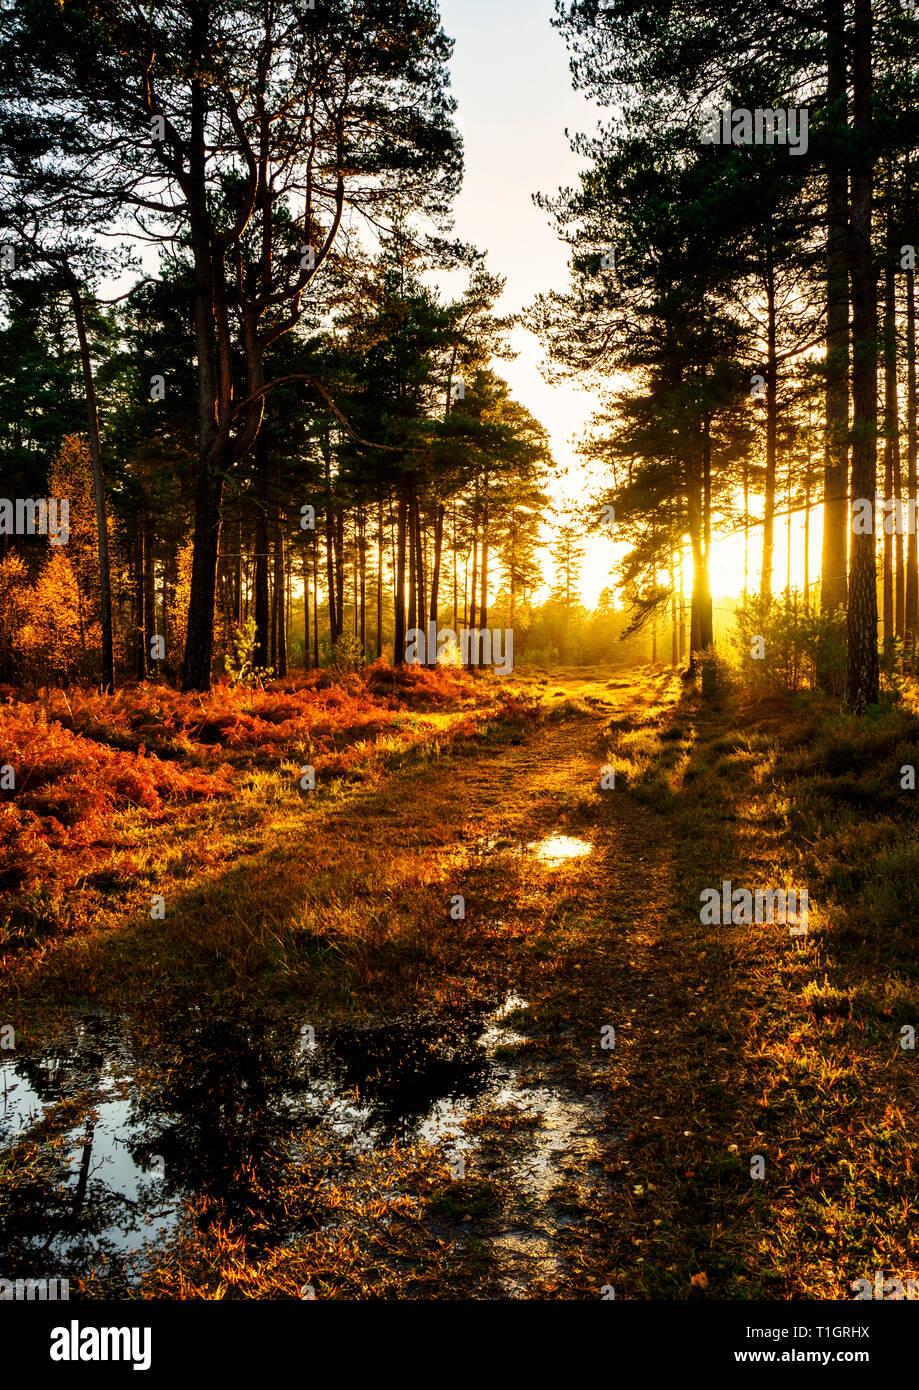 A blaze of autumnal golden light amongst the trees at Vinney Ridge in the New Forest, Hampshire. Taken back in November 2018. Stock Photo